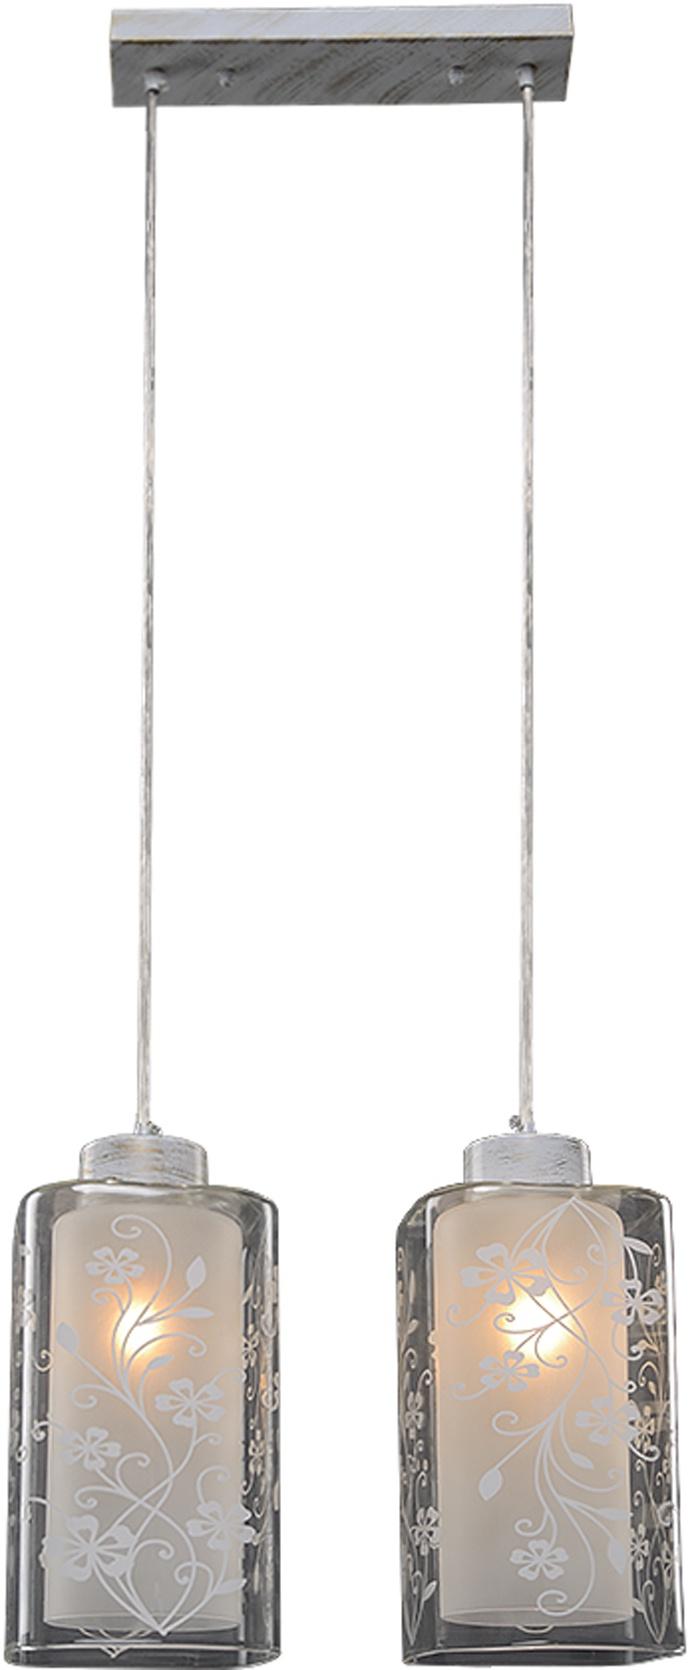 Потолочный светильник МАКСИСВЕТ 4970, 2-4970-2-WHS E27, 340х120х1150, 2-4970-2-WHS E27, белый